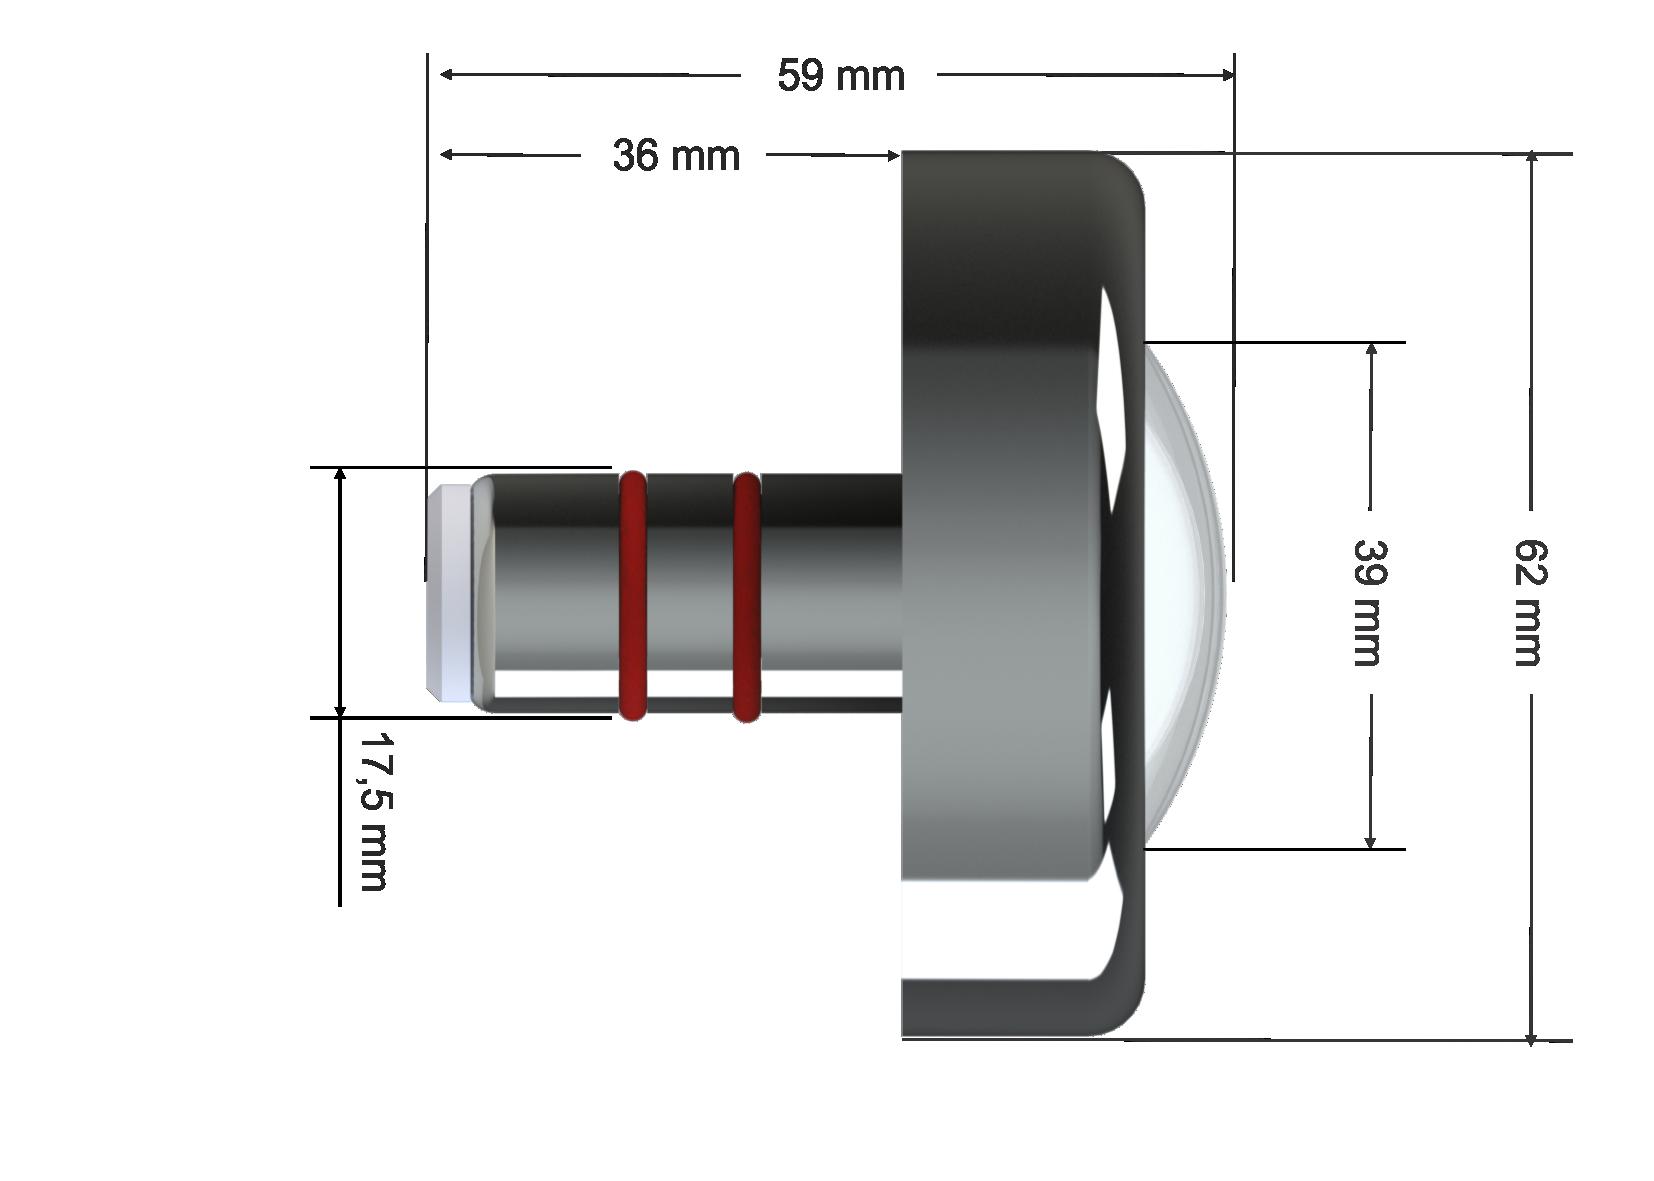 Refletor Power Led Branco 6000k - 9w INOX